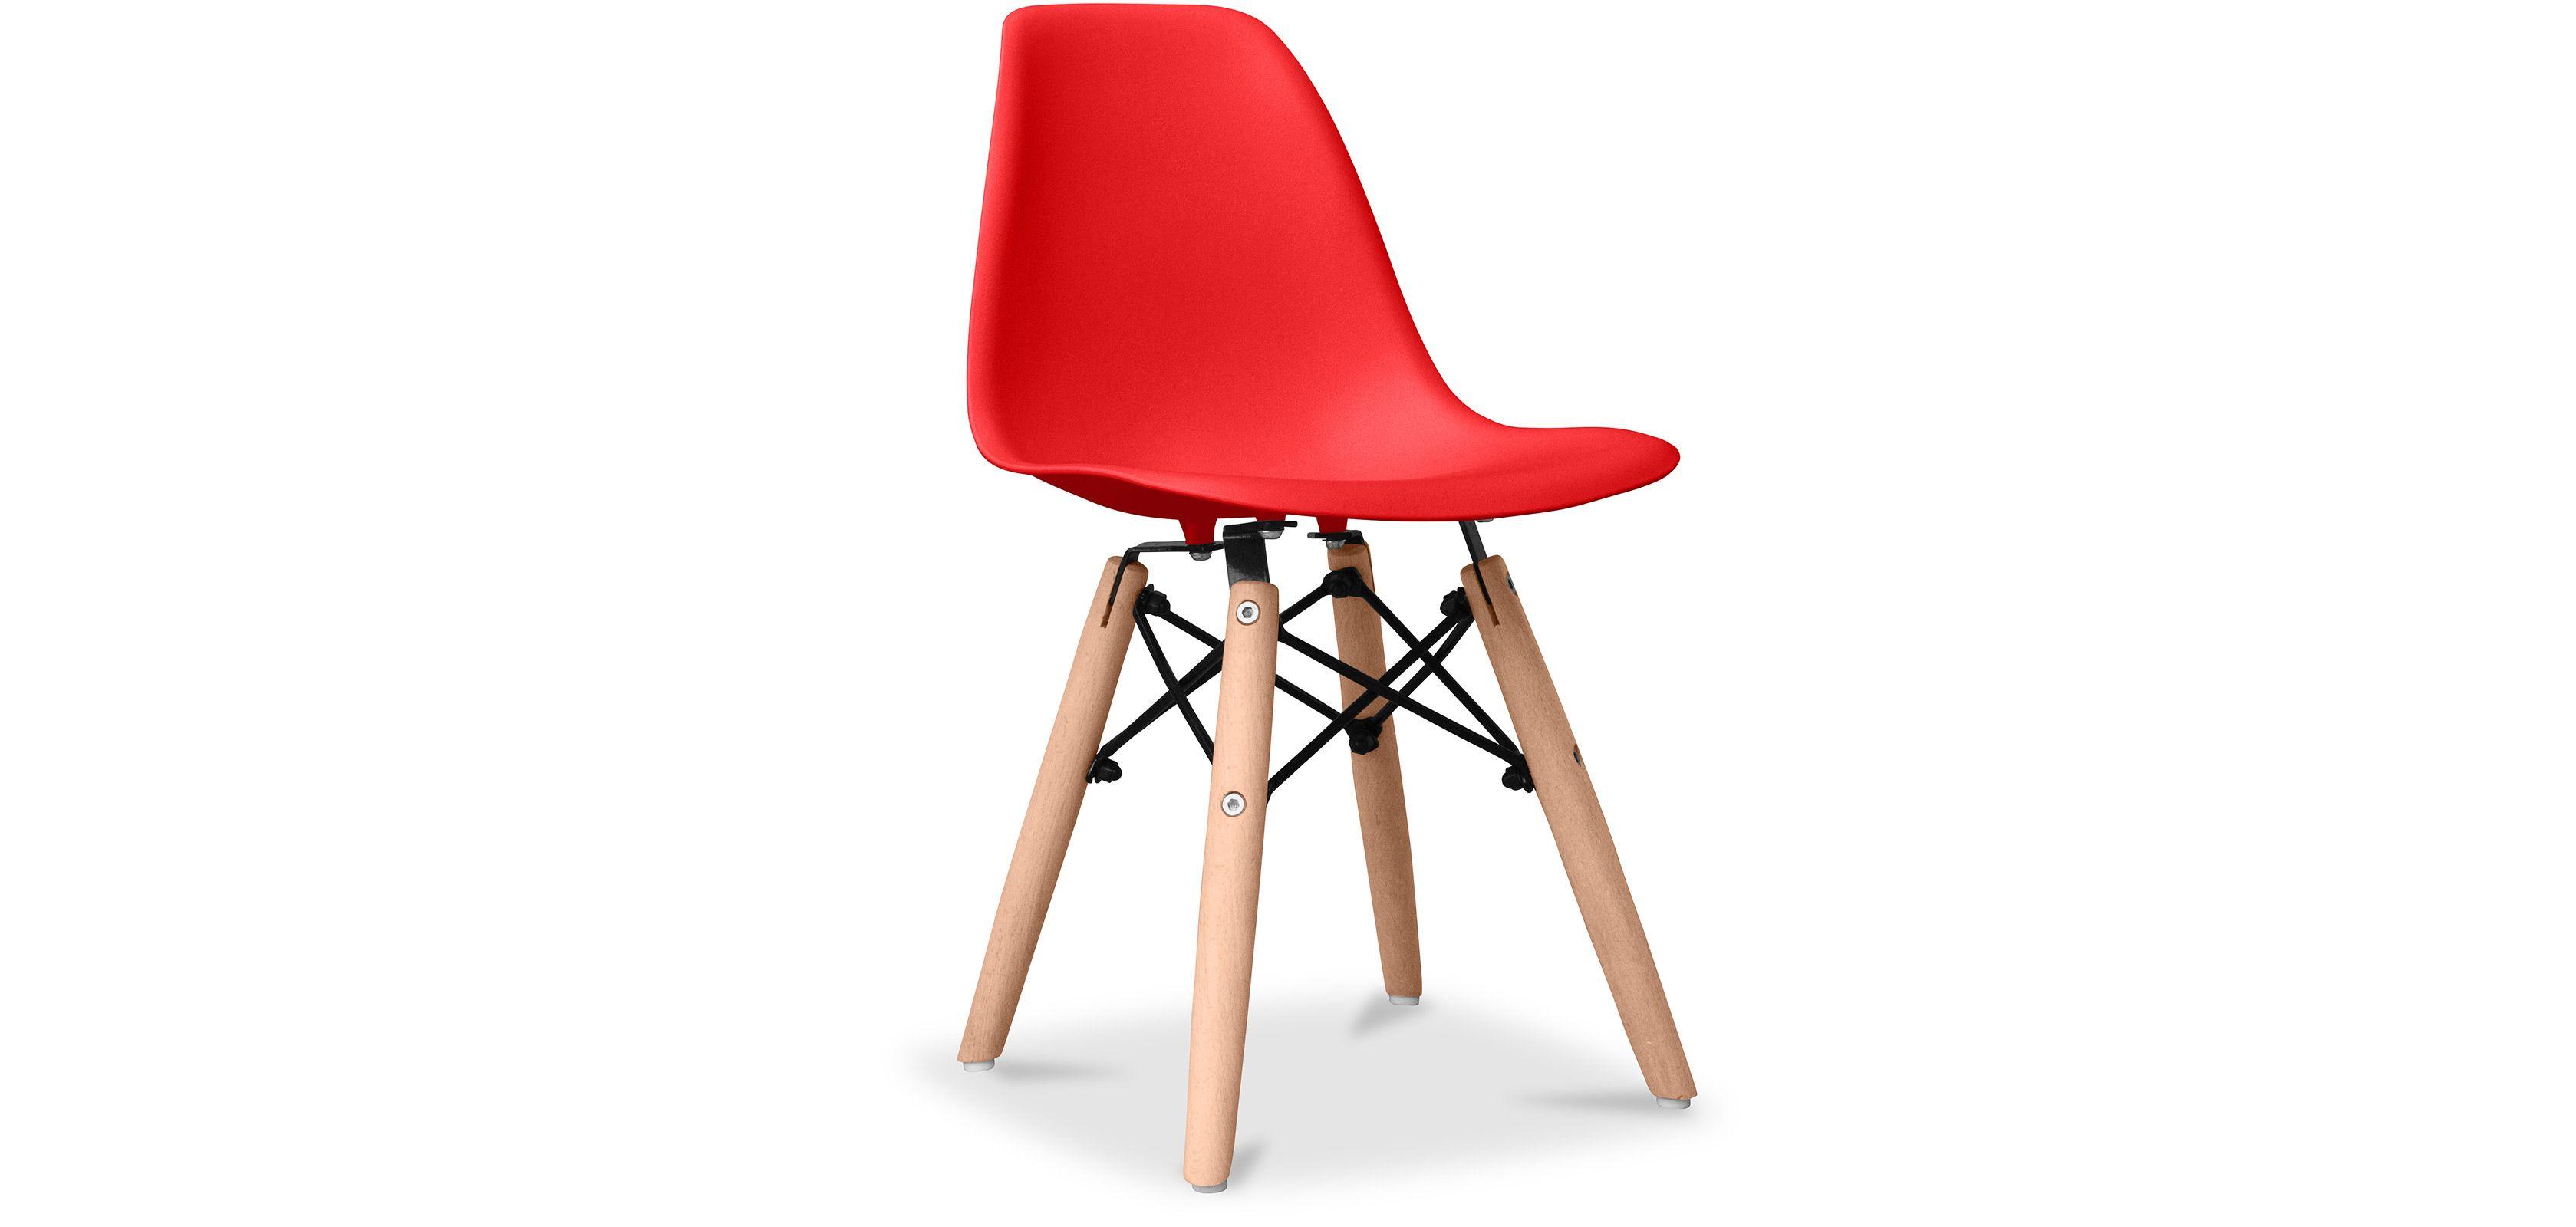 Chaise Enfant Geneva Polypropylene Matt Ikea High Chair Chair Mid Century Modern Chair